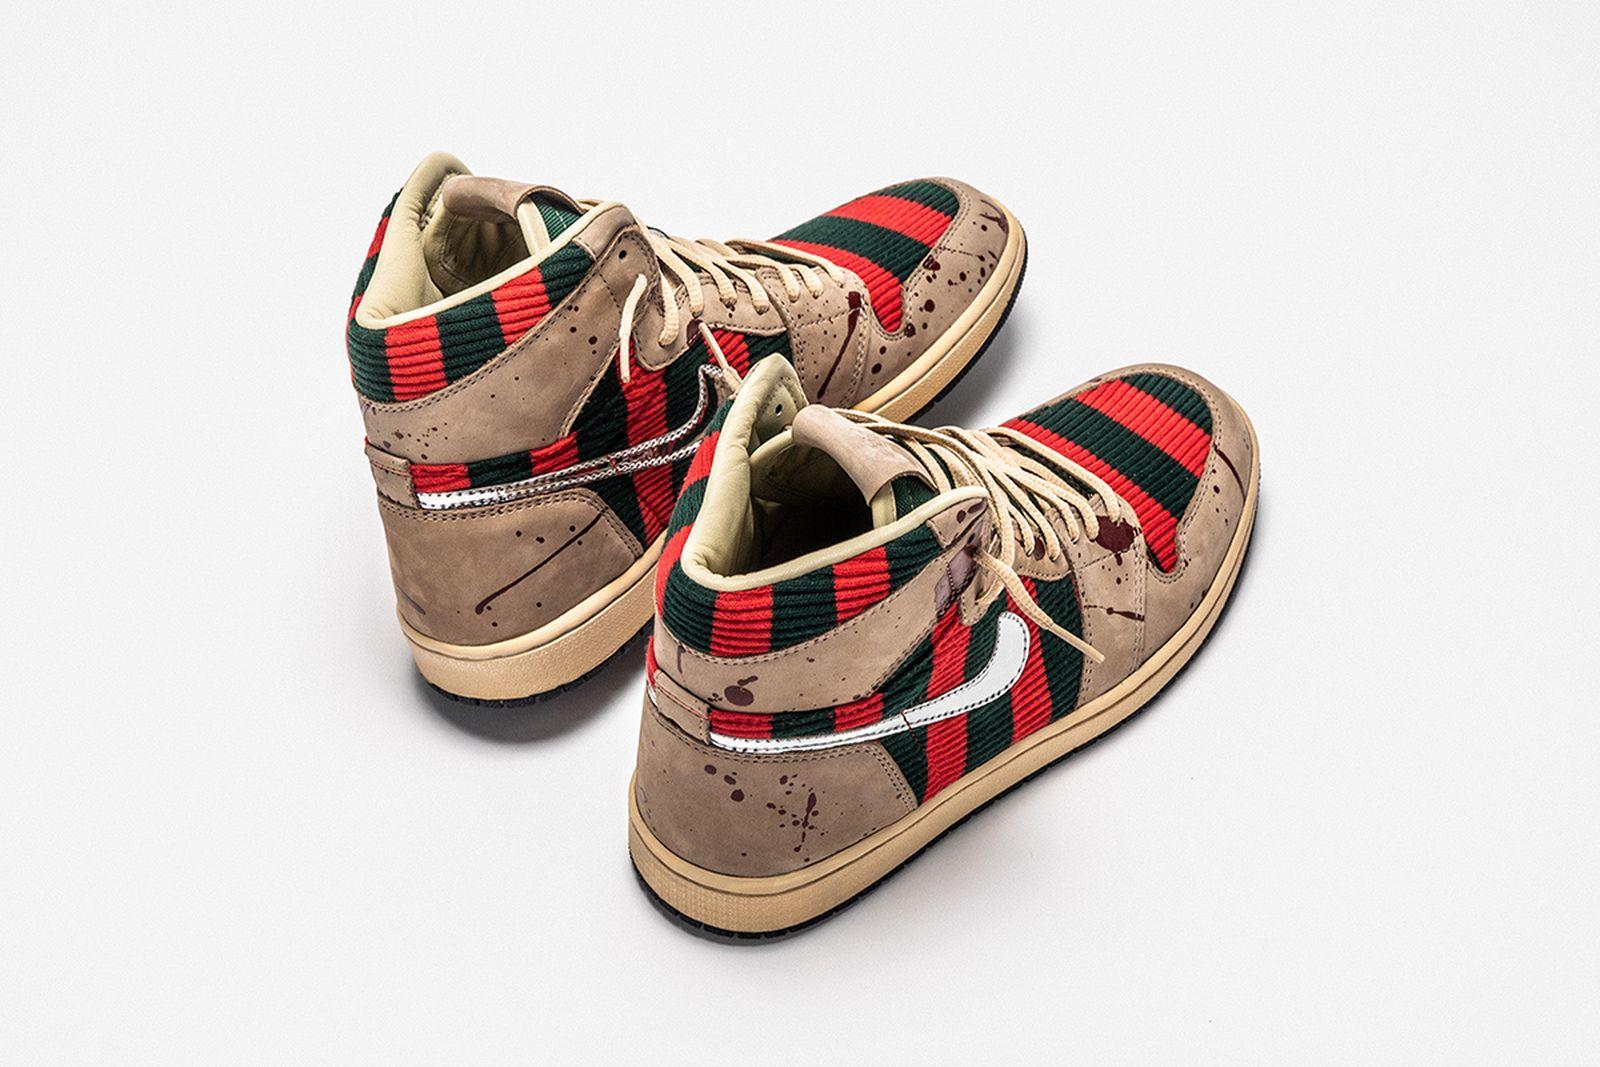 shoe-surgeon-nike-air-jordan-1-freddy-krueger-release-date-price-01